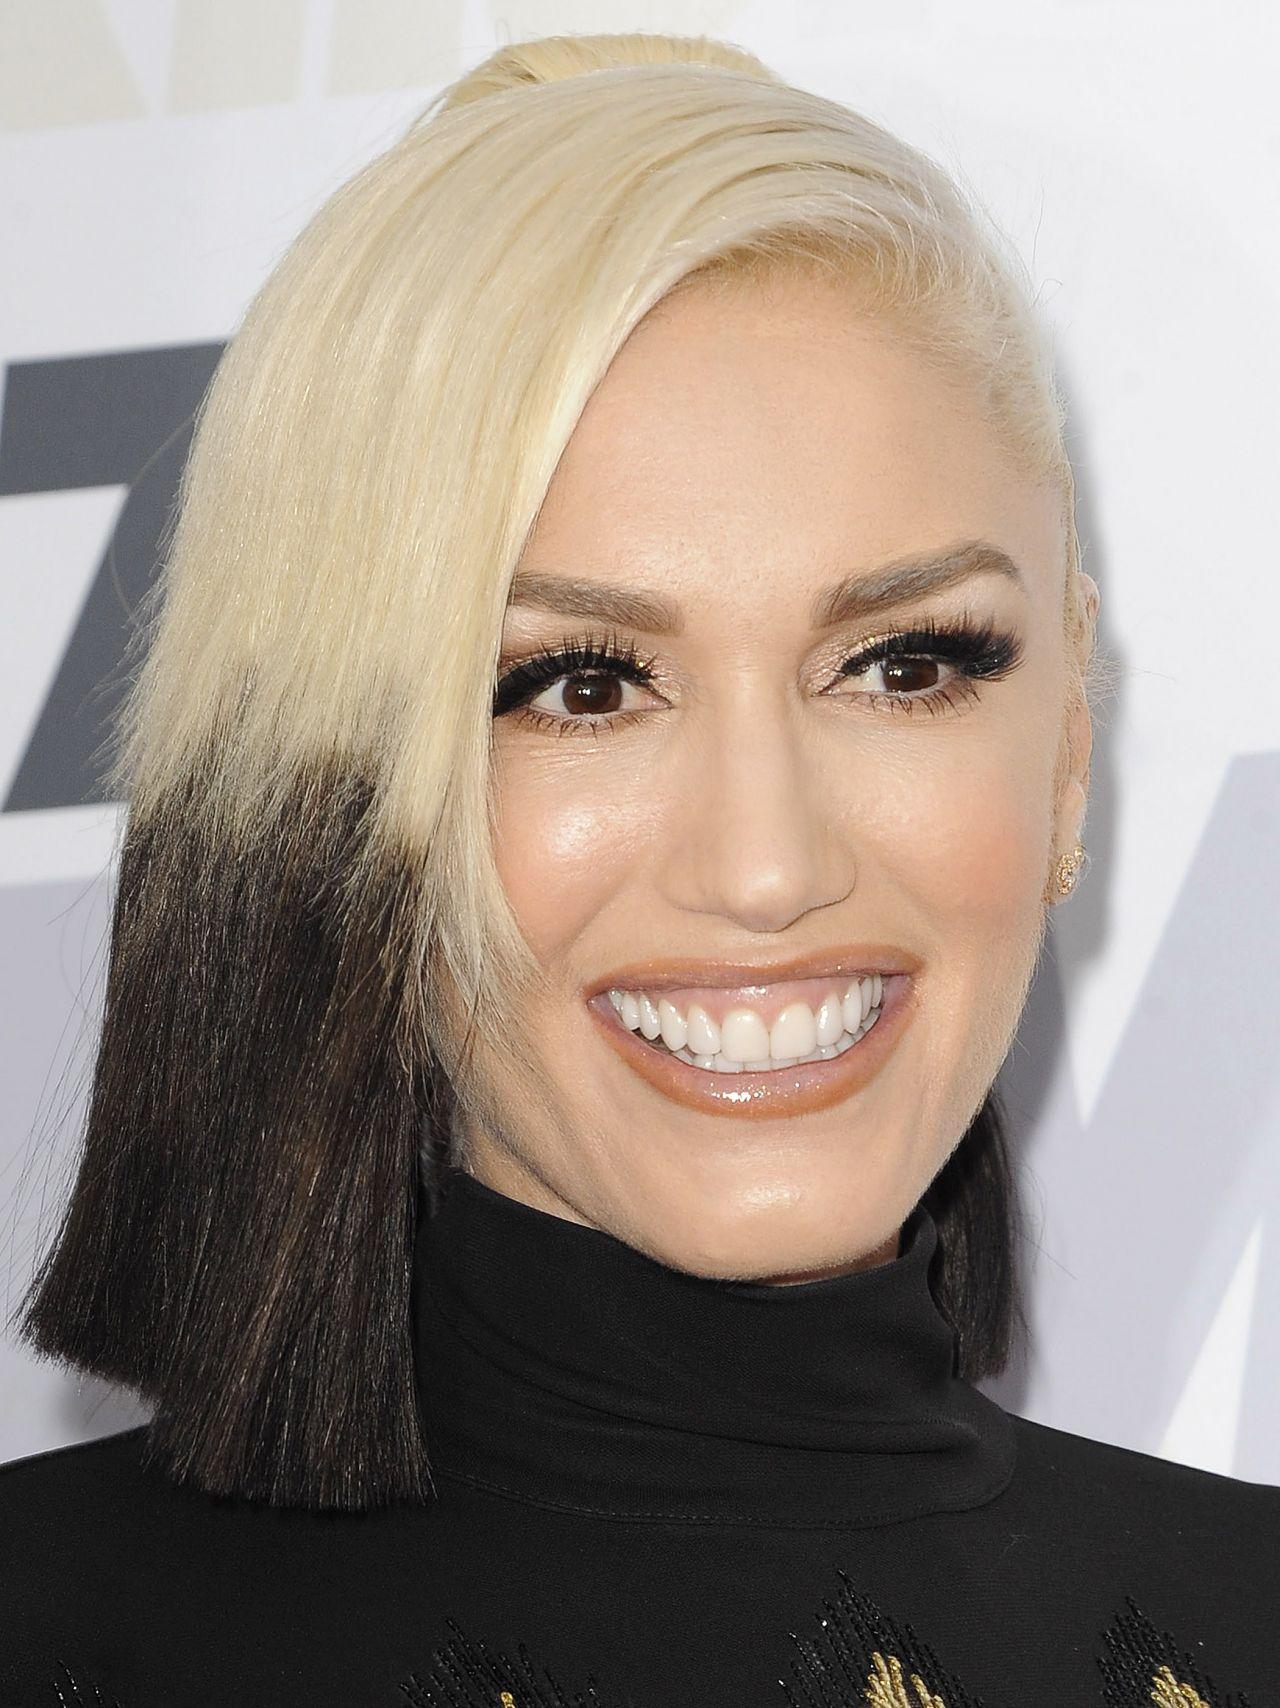 Gwen Stefani - 102.7 KIIS FM's Wango Tango in Carson, CA 5 ... Gwen Stefani